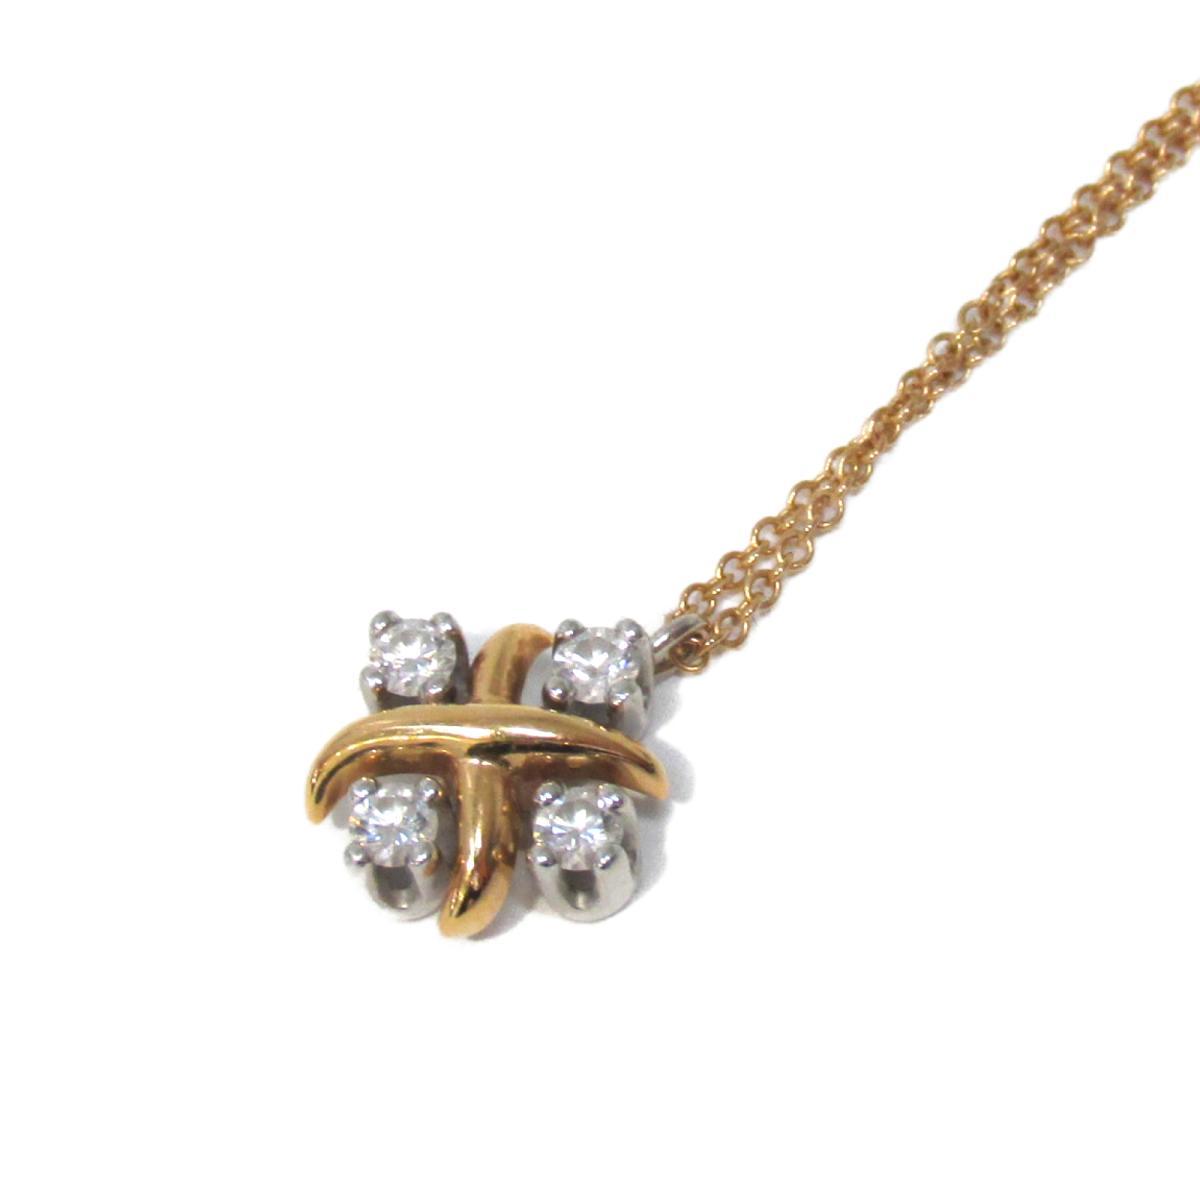 [Used] Tiffany & co Schlumbase Necklace Ladies K18PG (750) Pink Gold PT900 Diamond | TIFFANY&CO BRANDOFF Brand Off Brand Accessory Pendant